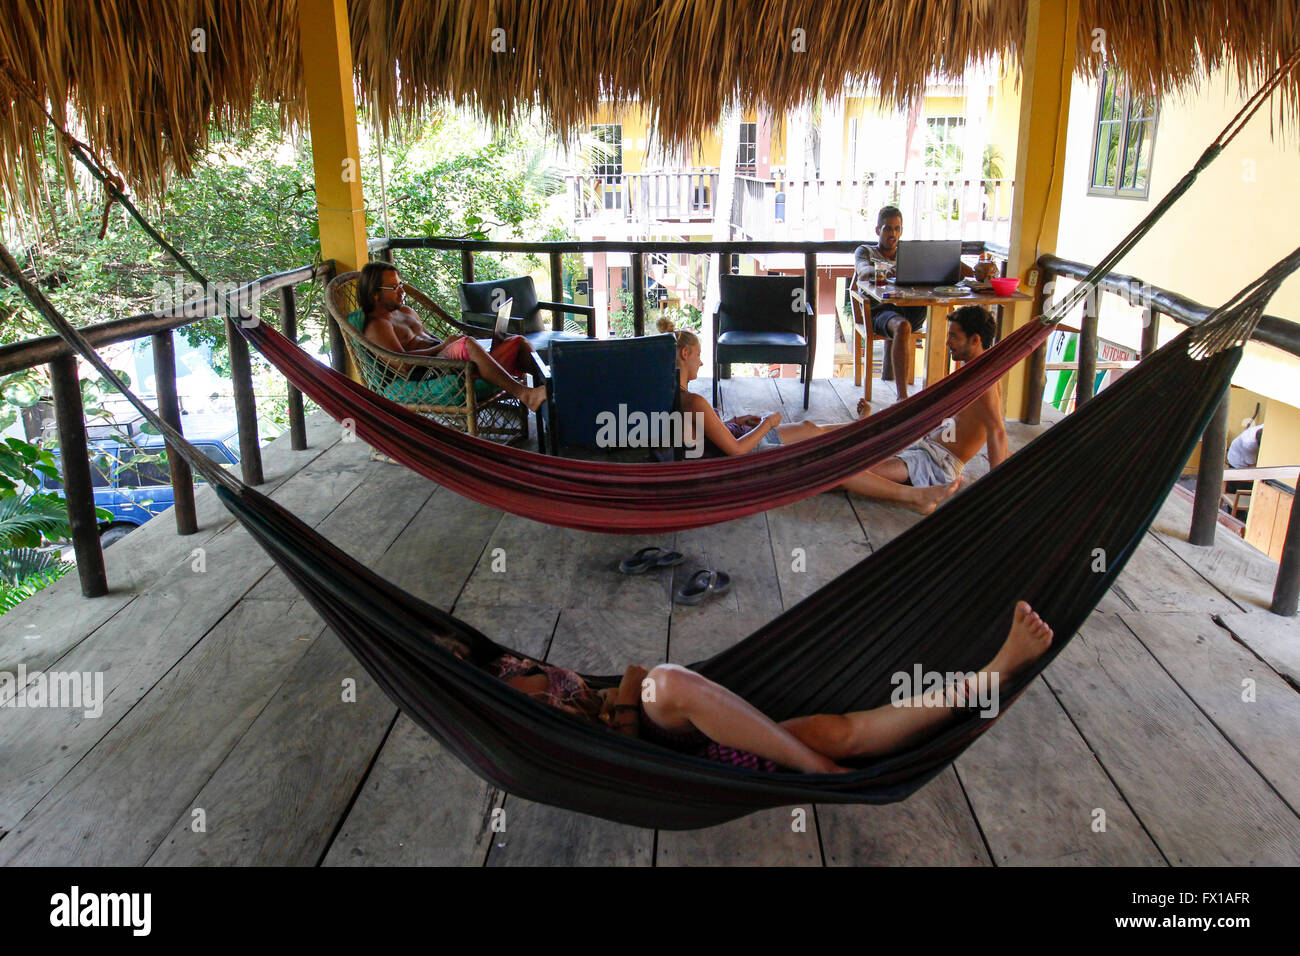 Group of European tourists resting on hammocks. Photographed at El Tunco beach, El Salvador, - Stock Image